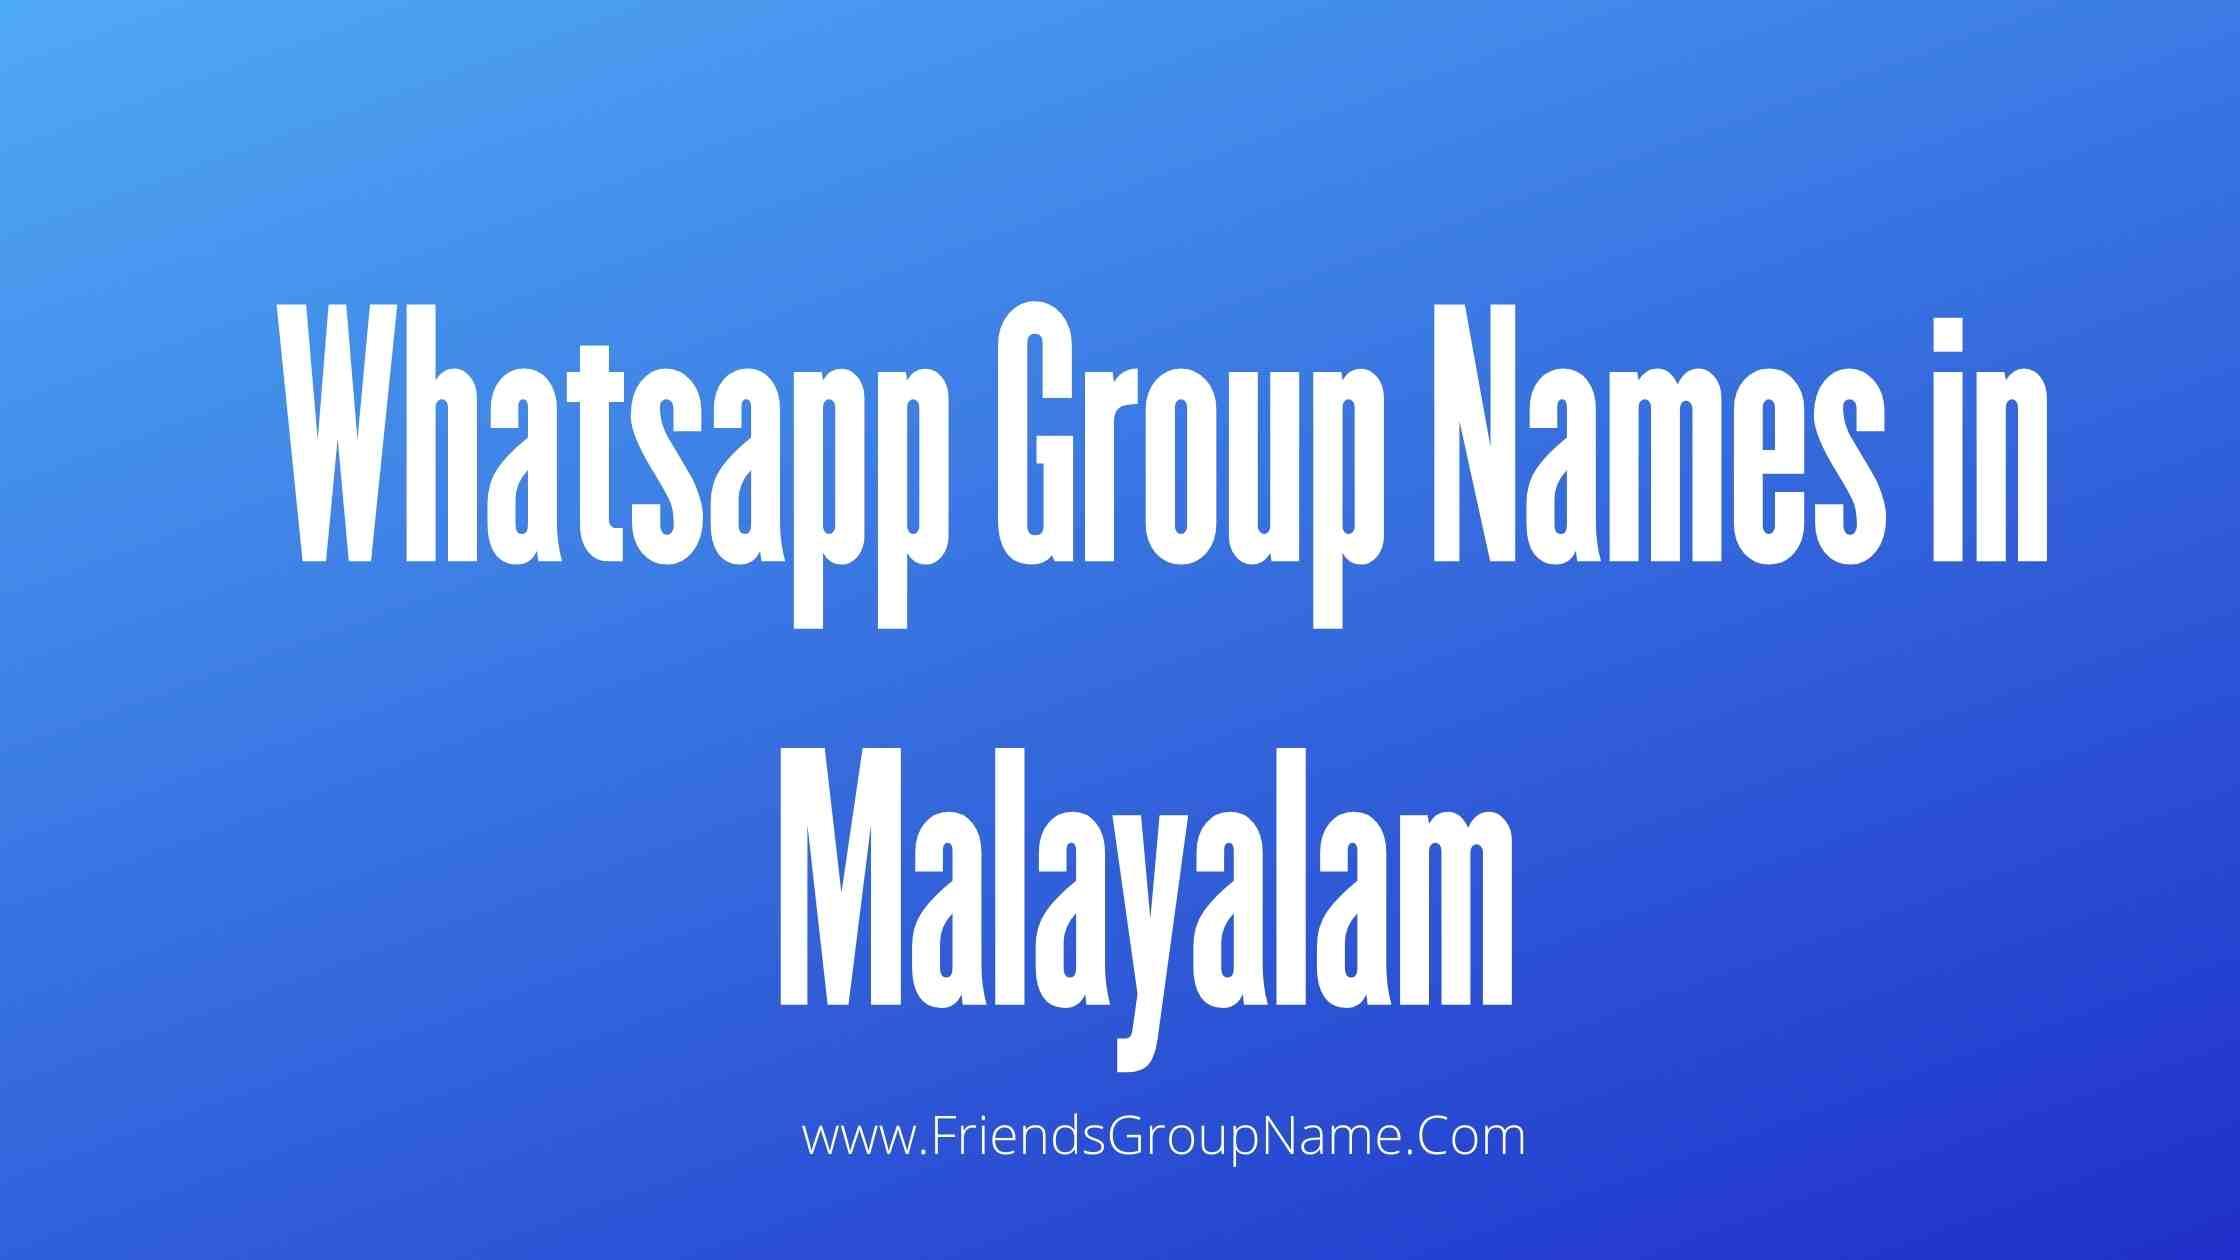 Whatsapp Group Names In Malayalam